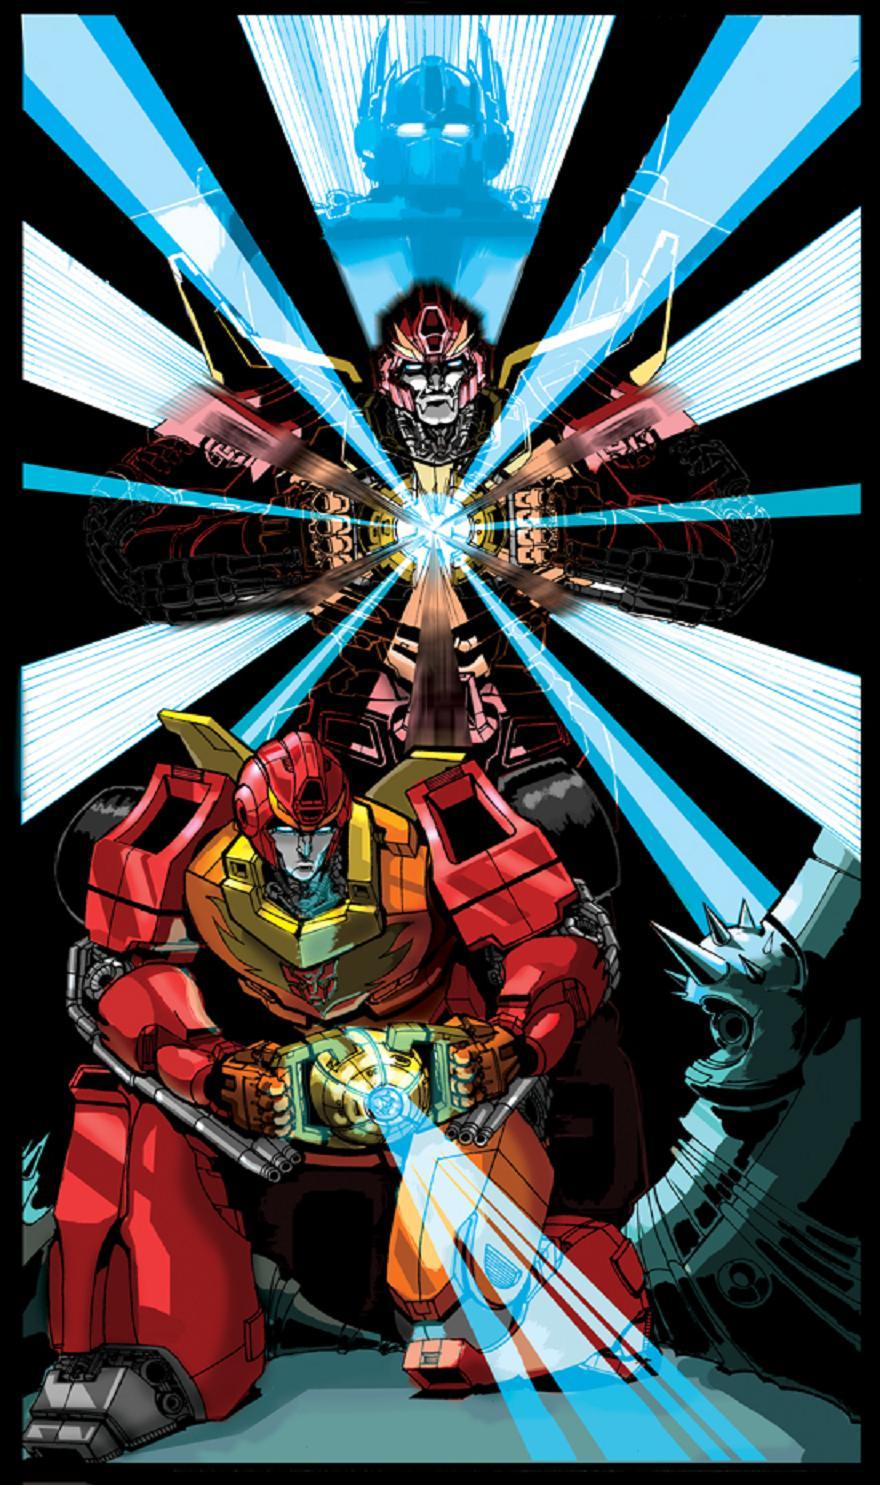 Transformers Animated Wallpaper Transformers Matrix Wallpapers Rodimus Prime G1 3d